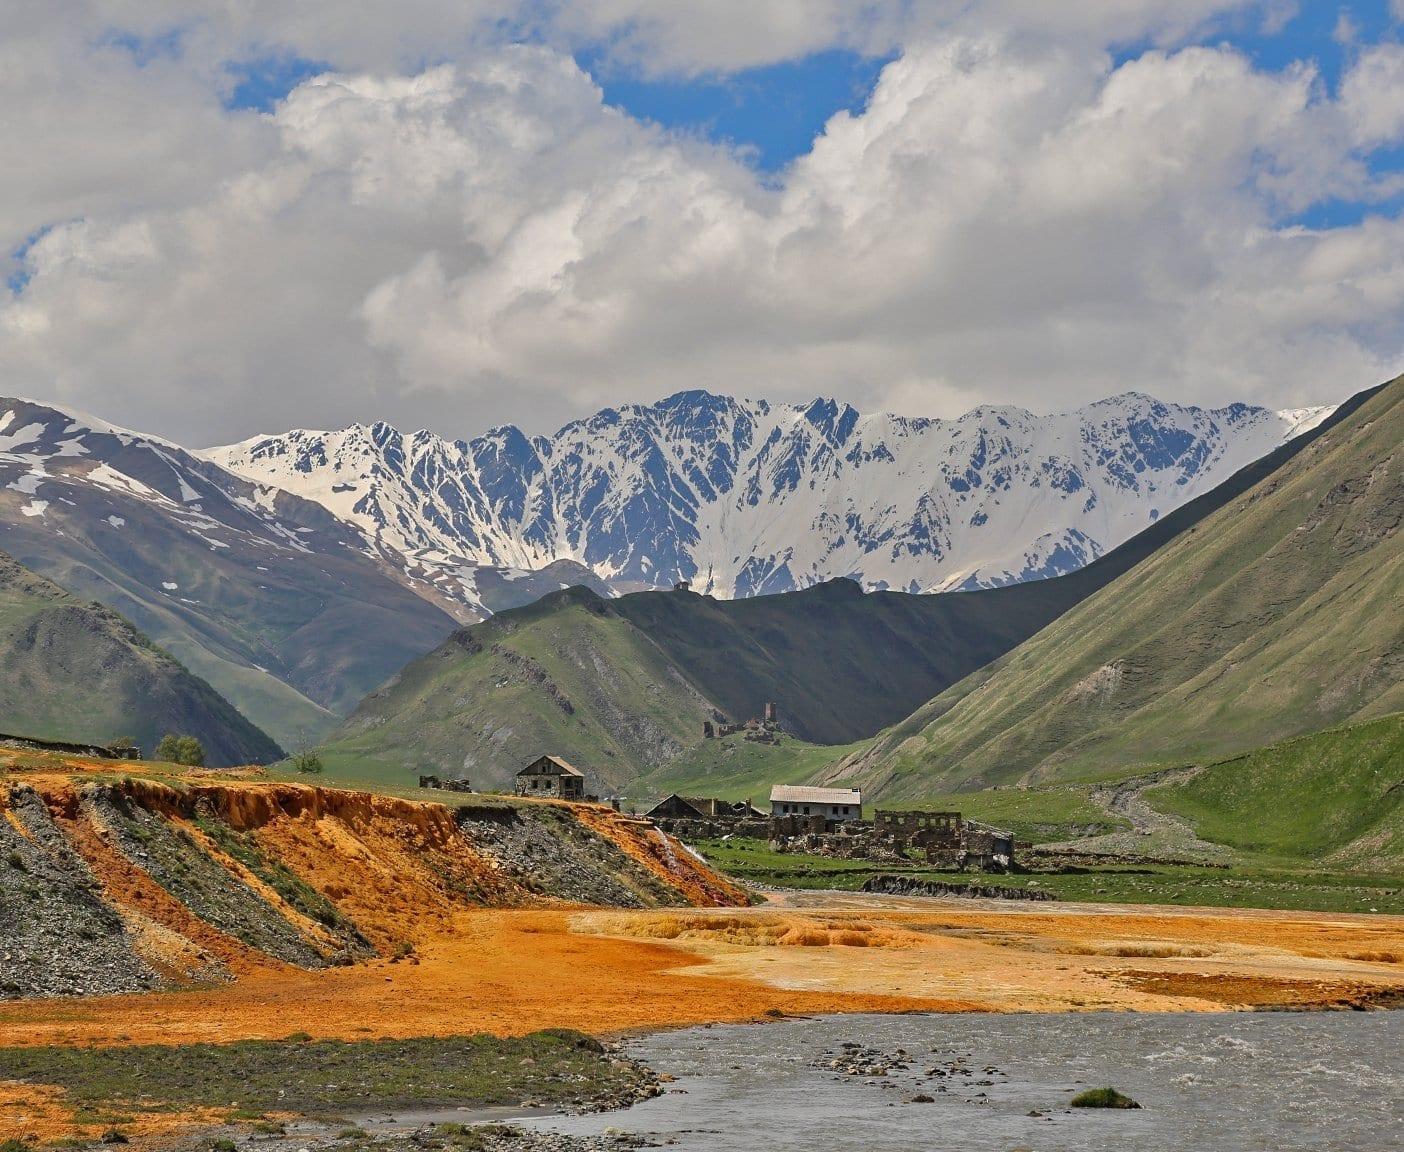 georgien-wohnmobil-erfahrungsbericht-camping-urlaub-preisniveau-tiflis-vanlife-truzo-valley-2